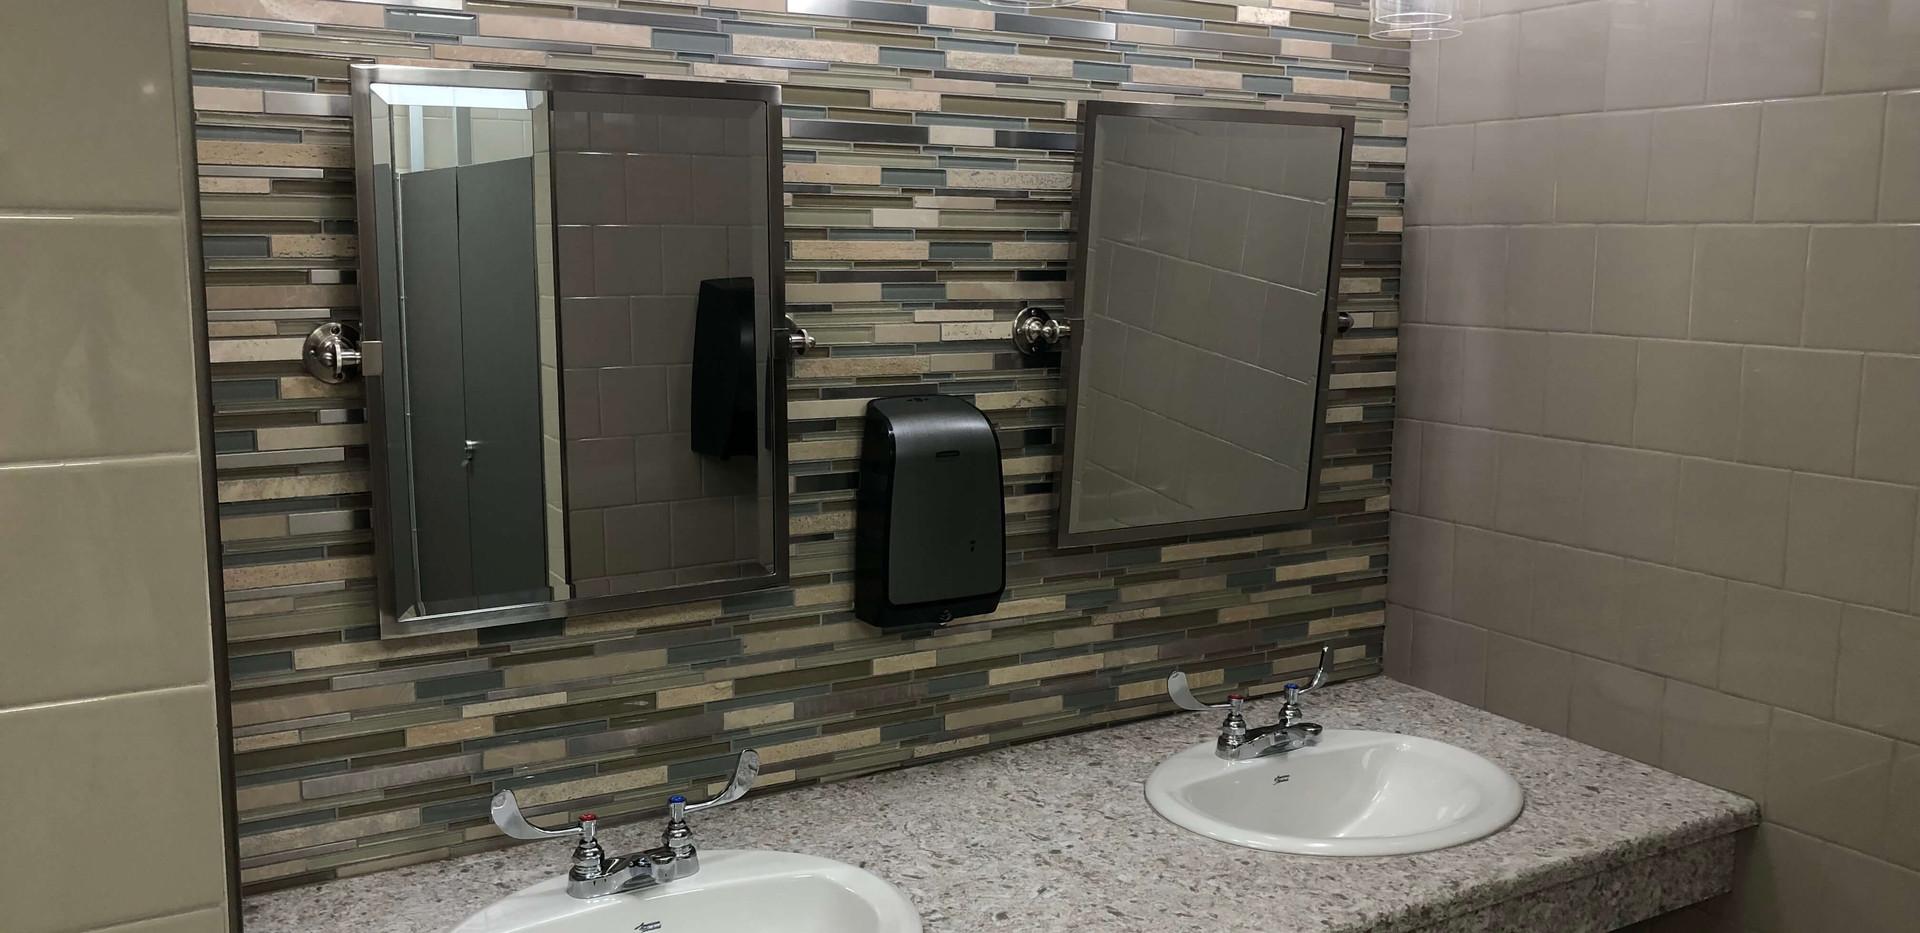 City Center East - ADA Restroom